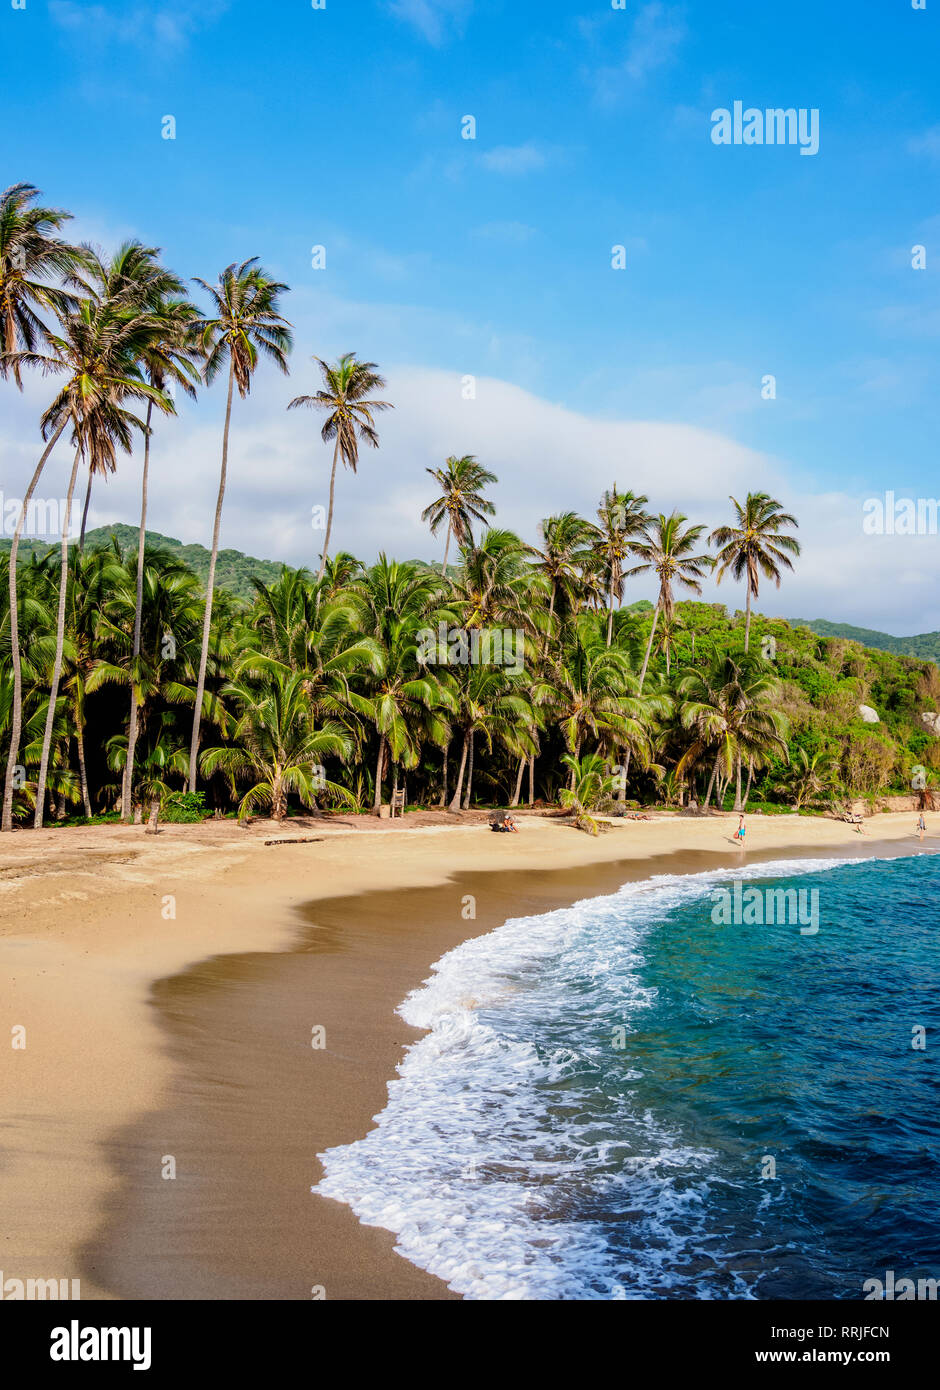 El Cabo San Juan del Guia beach, Tayrona National Natural Park, Magdalena Department, Caribbean, Colombia, South America - Stock Image